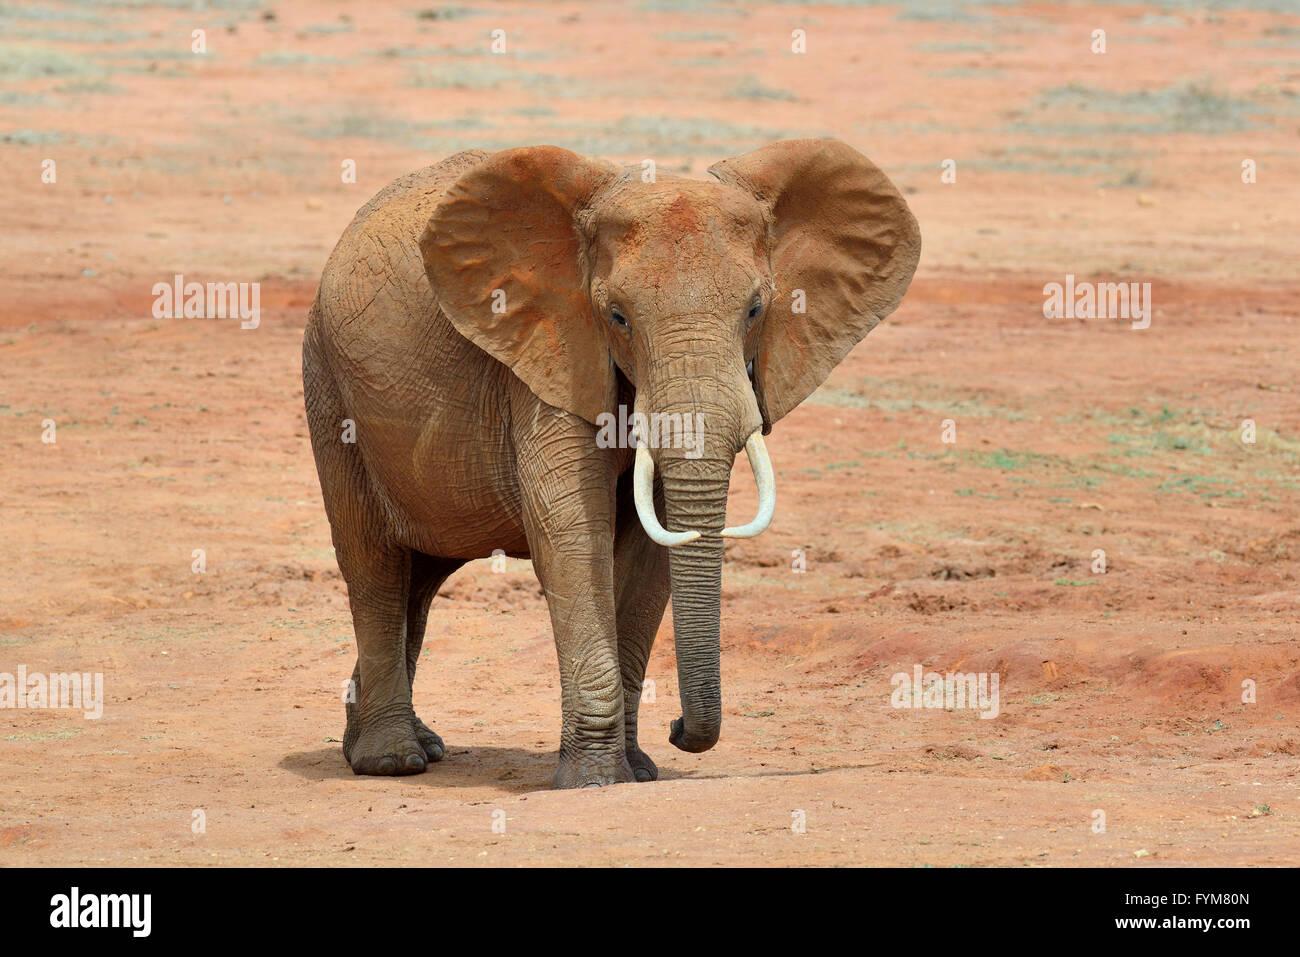 En el parque nacional de elefantes de Kenya, Africa. Imagen De Stock